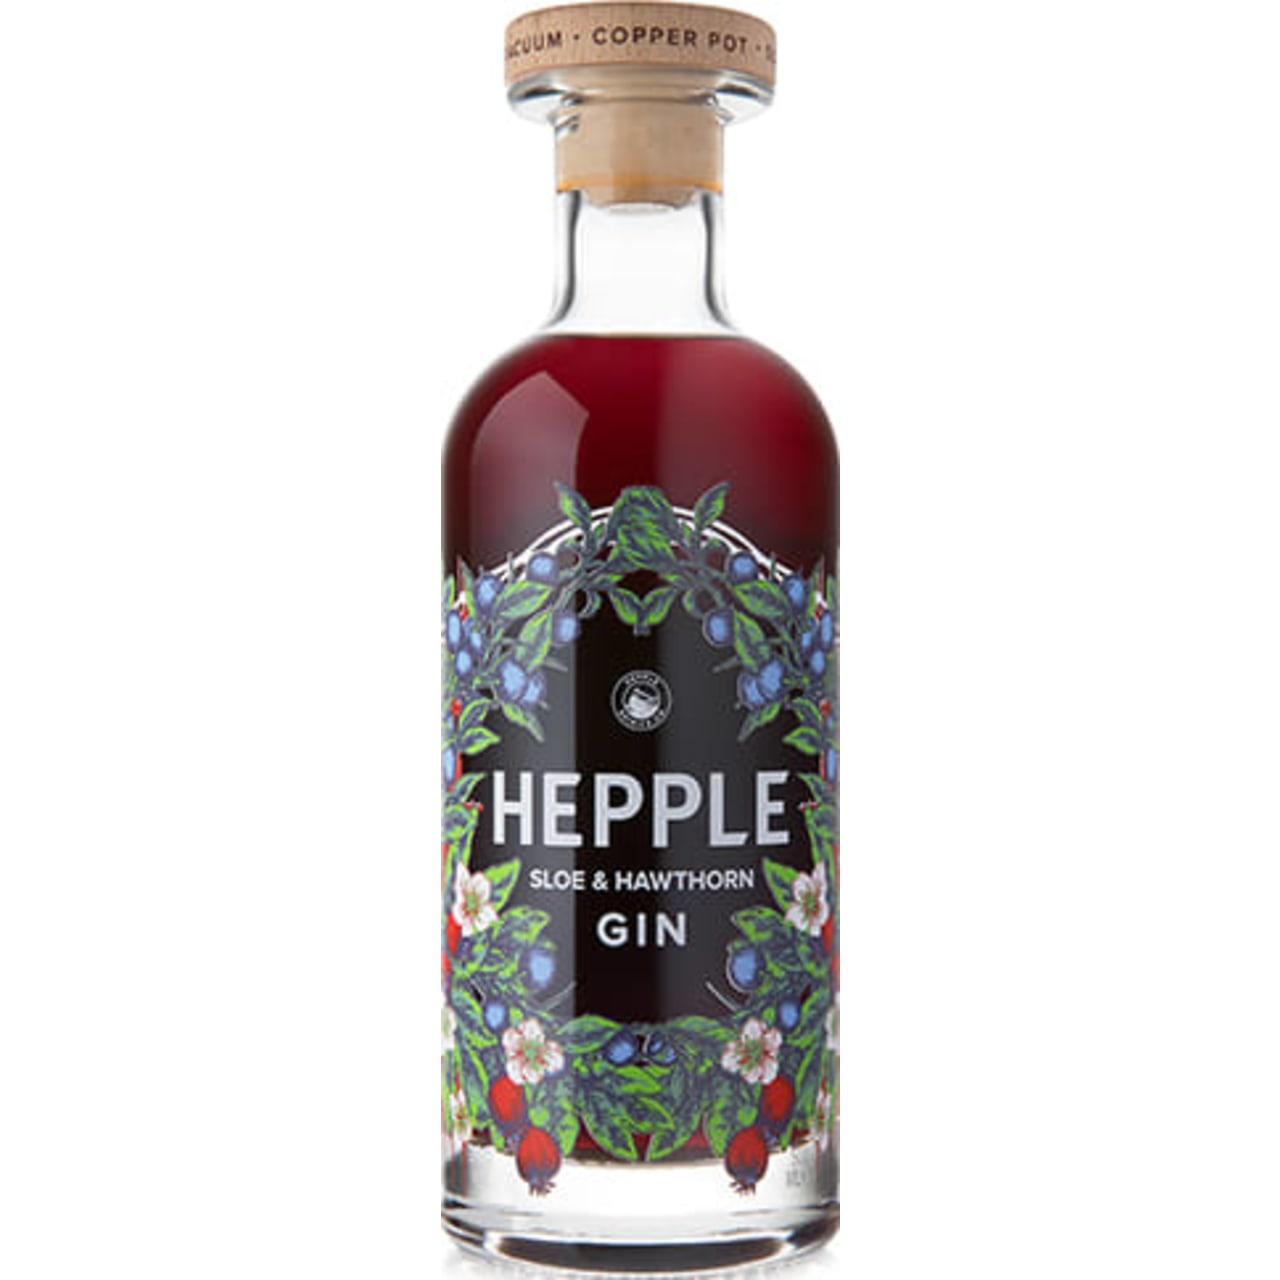 Hepple Sloe & Hawthorn Gin